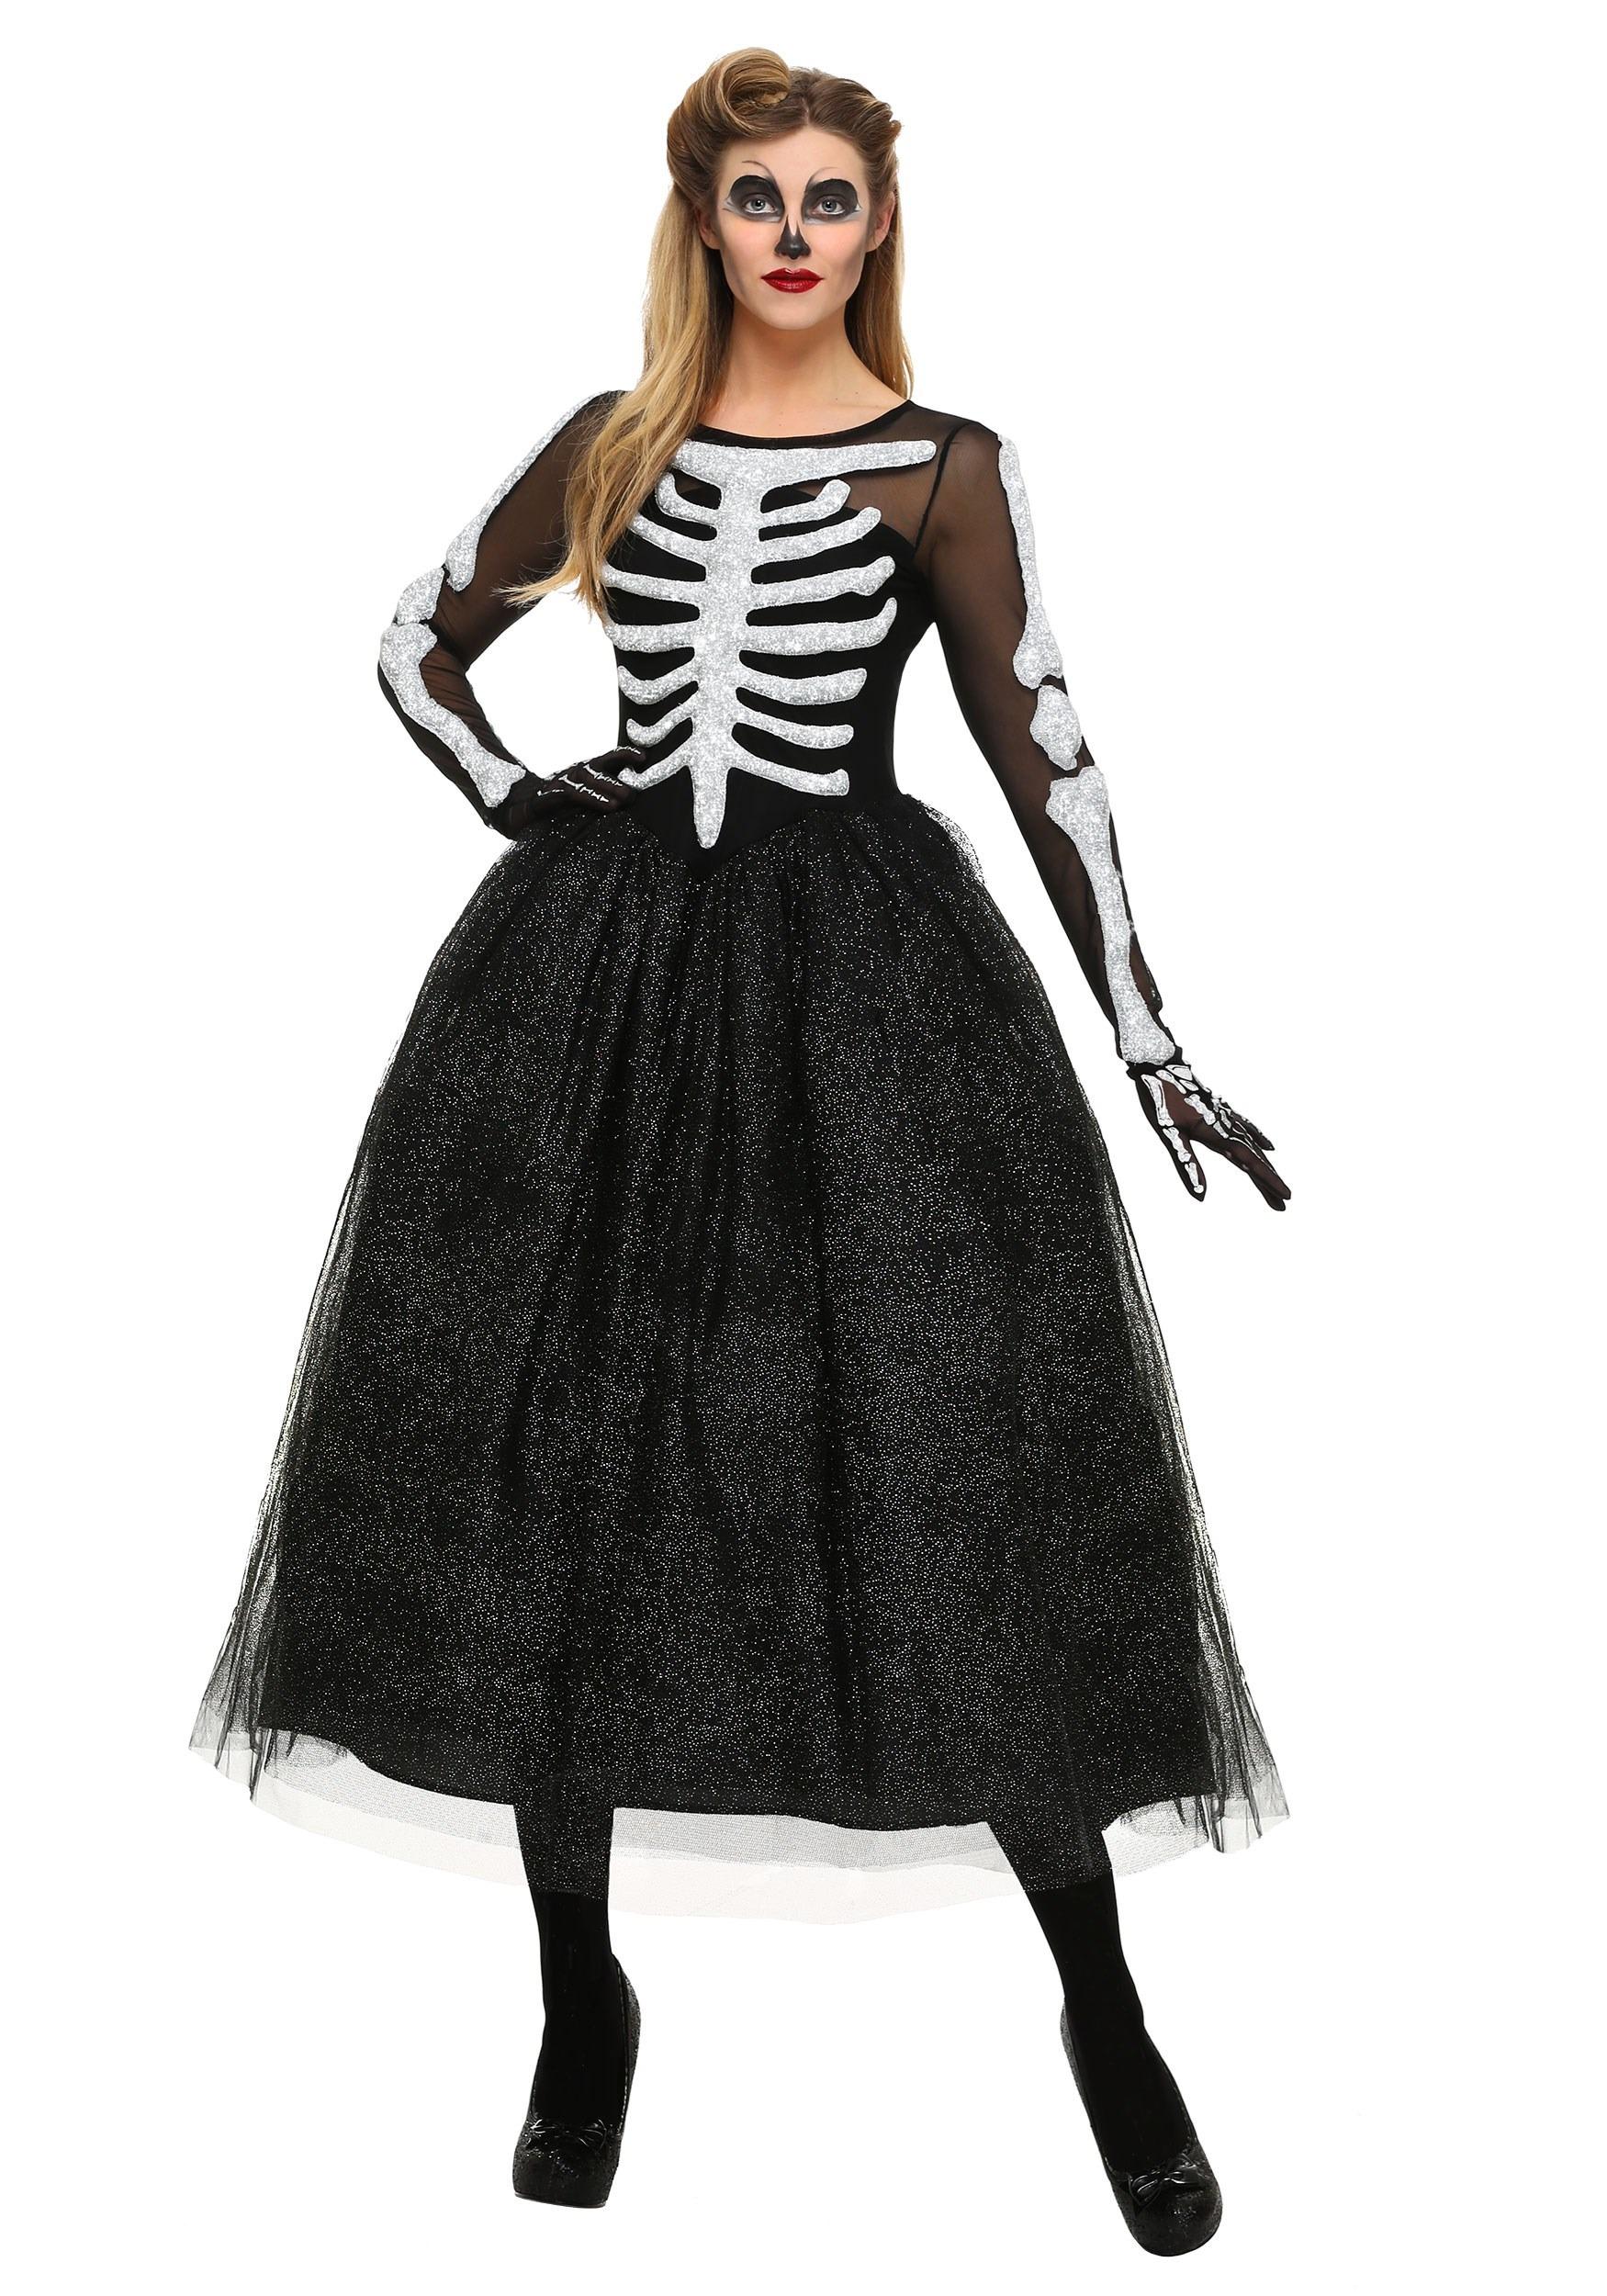 Women's_Skeleton_Beauty_Costume